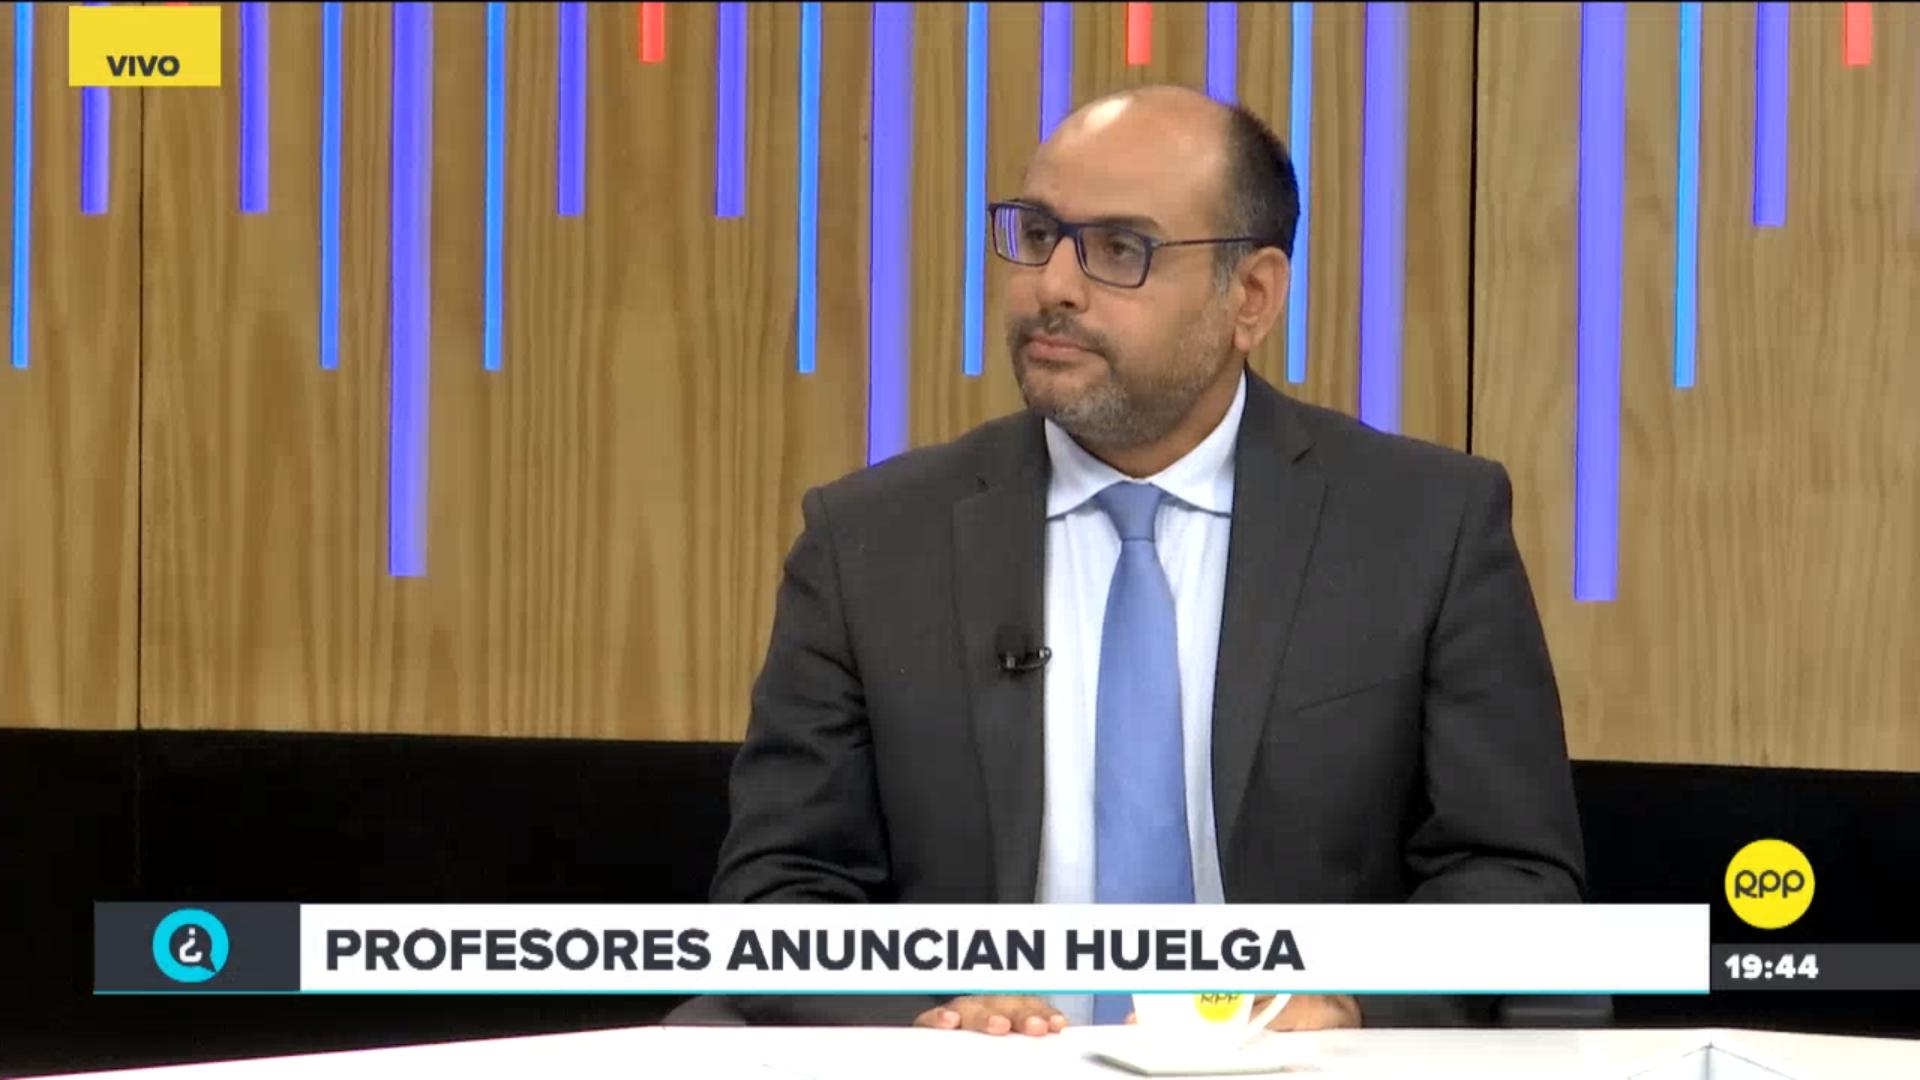 Ministro de Educación, Daniel Alfaro, se pronunció sobre la huelga que anuncian sectores gremiales de docentes.